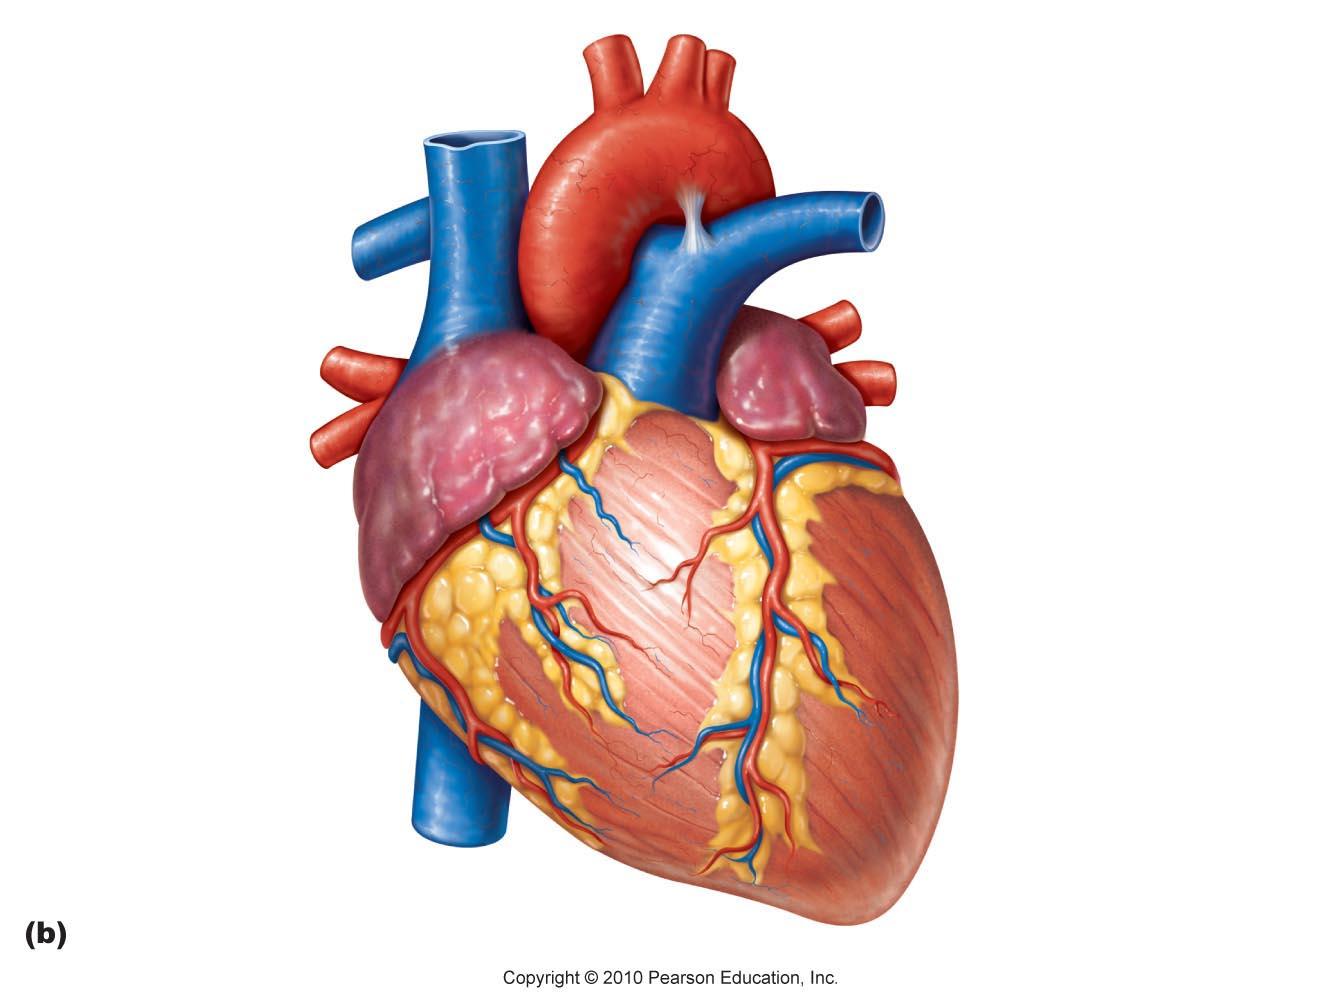 98 human heart.